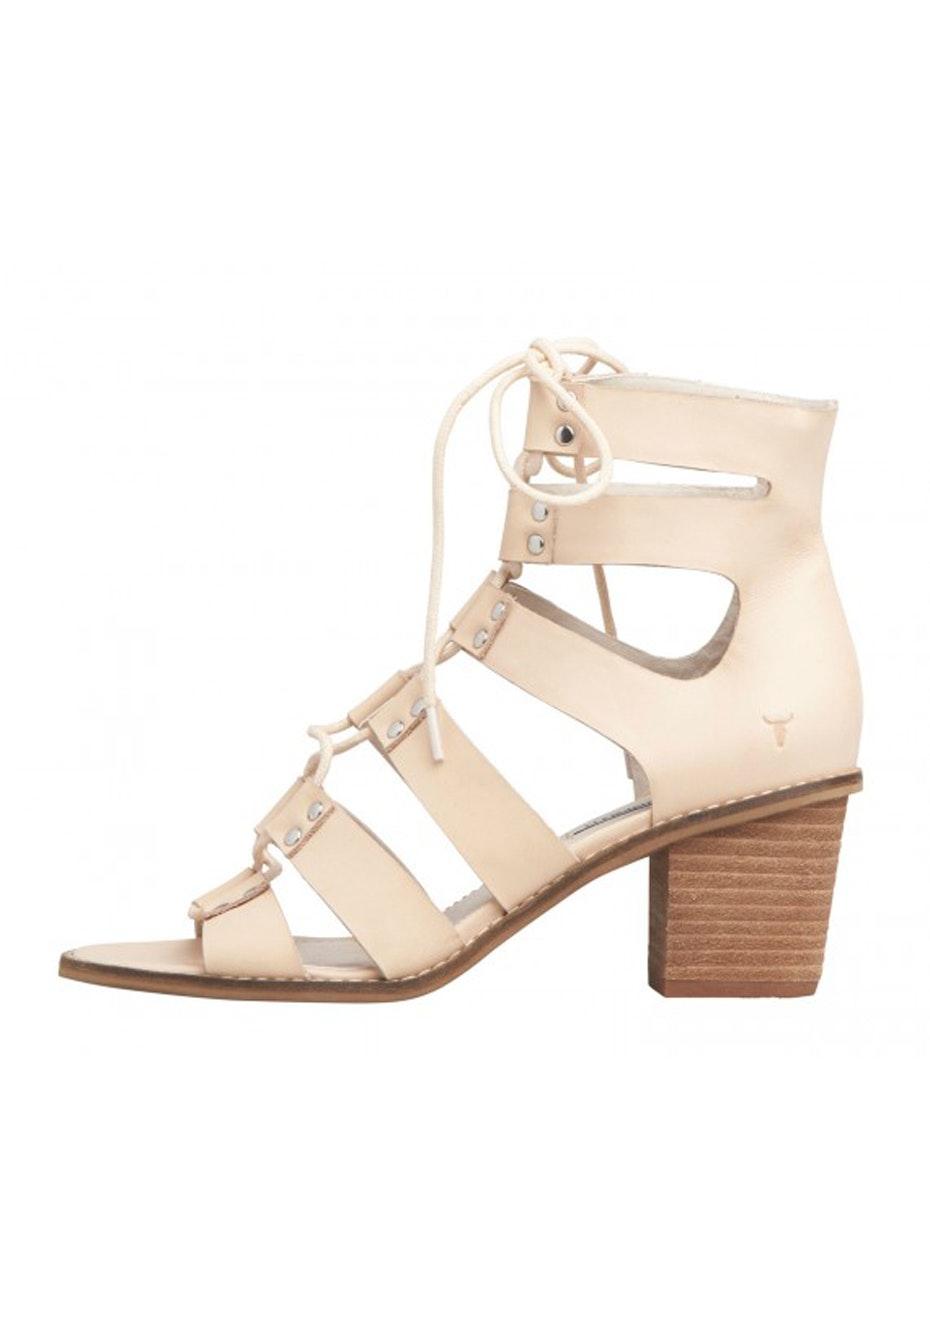 Windsor Smith - Vine - Seashell Leather